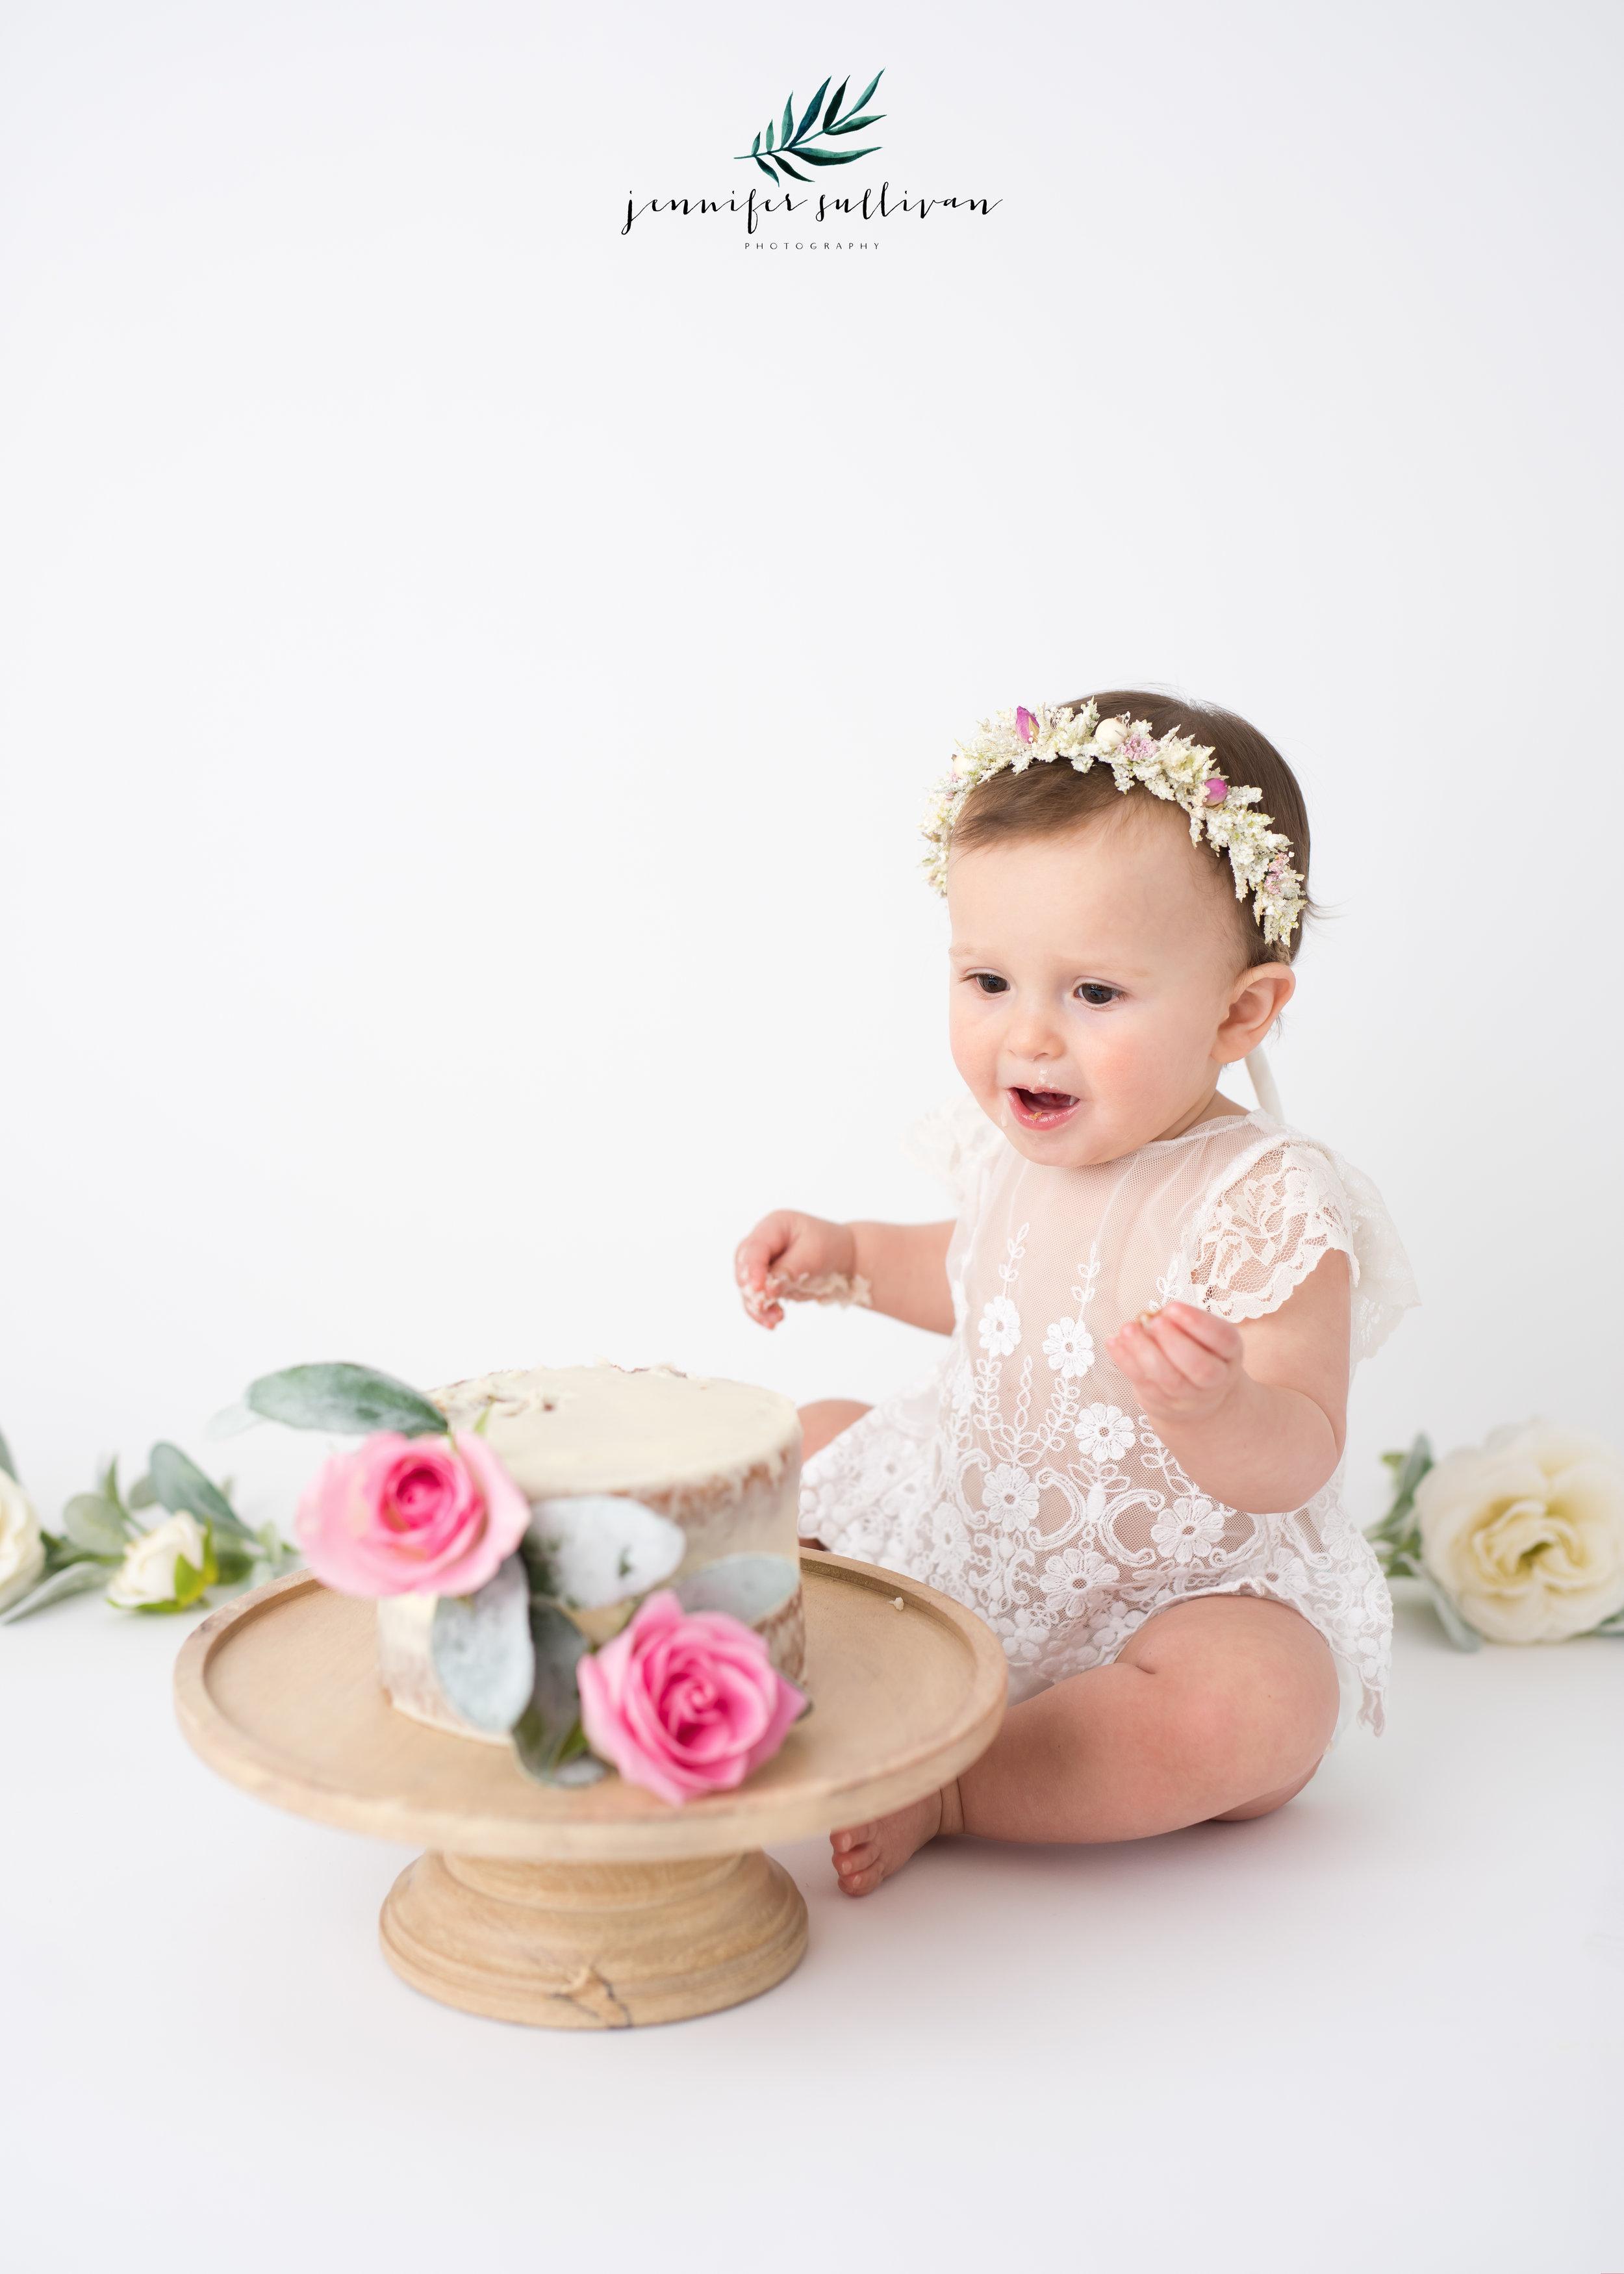 DARTMOUTH baby PHOTOGRAPHER-400-8.jpg